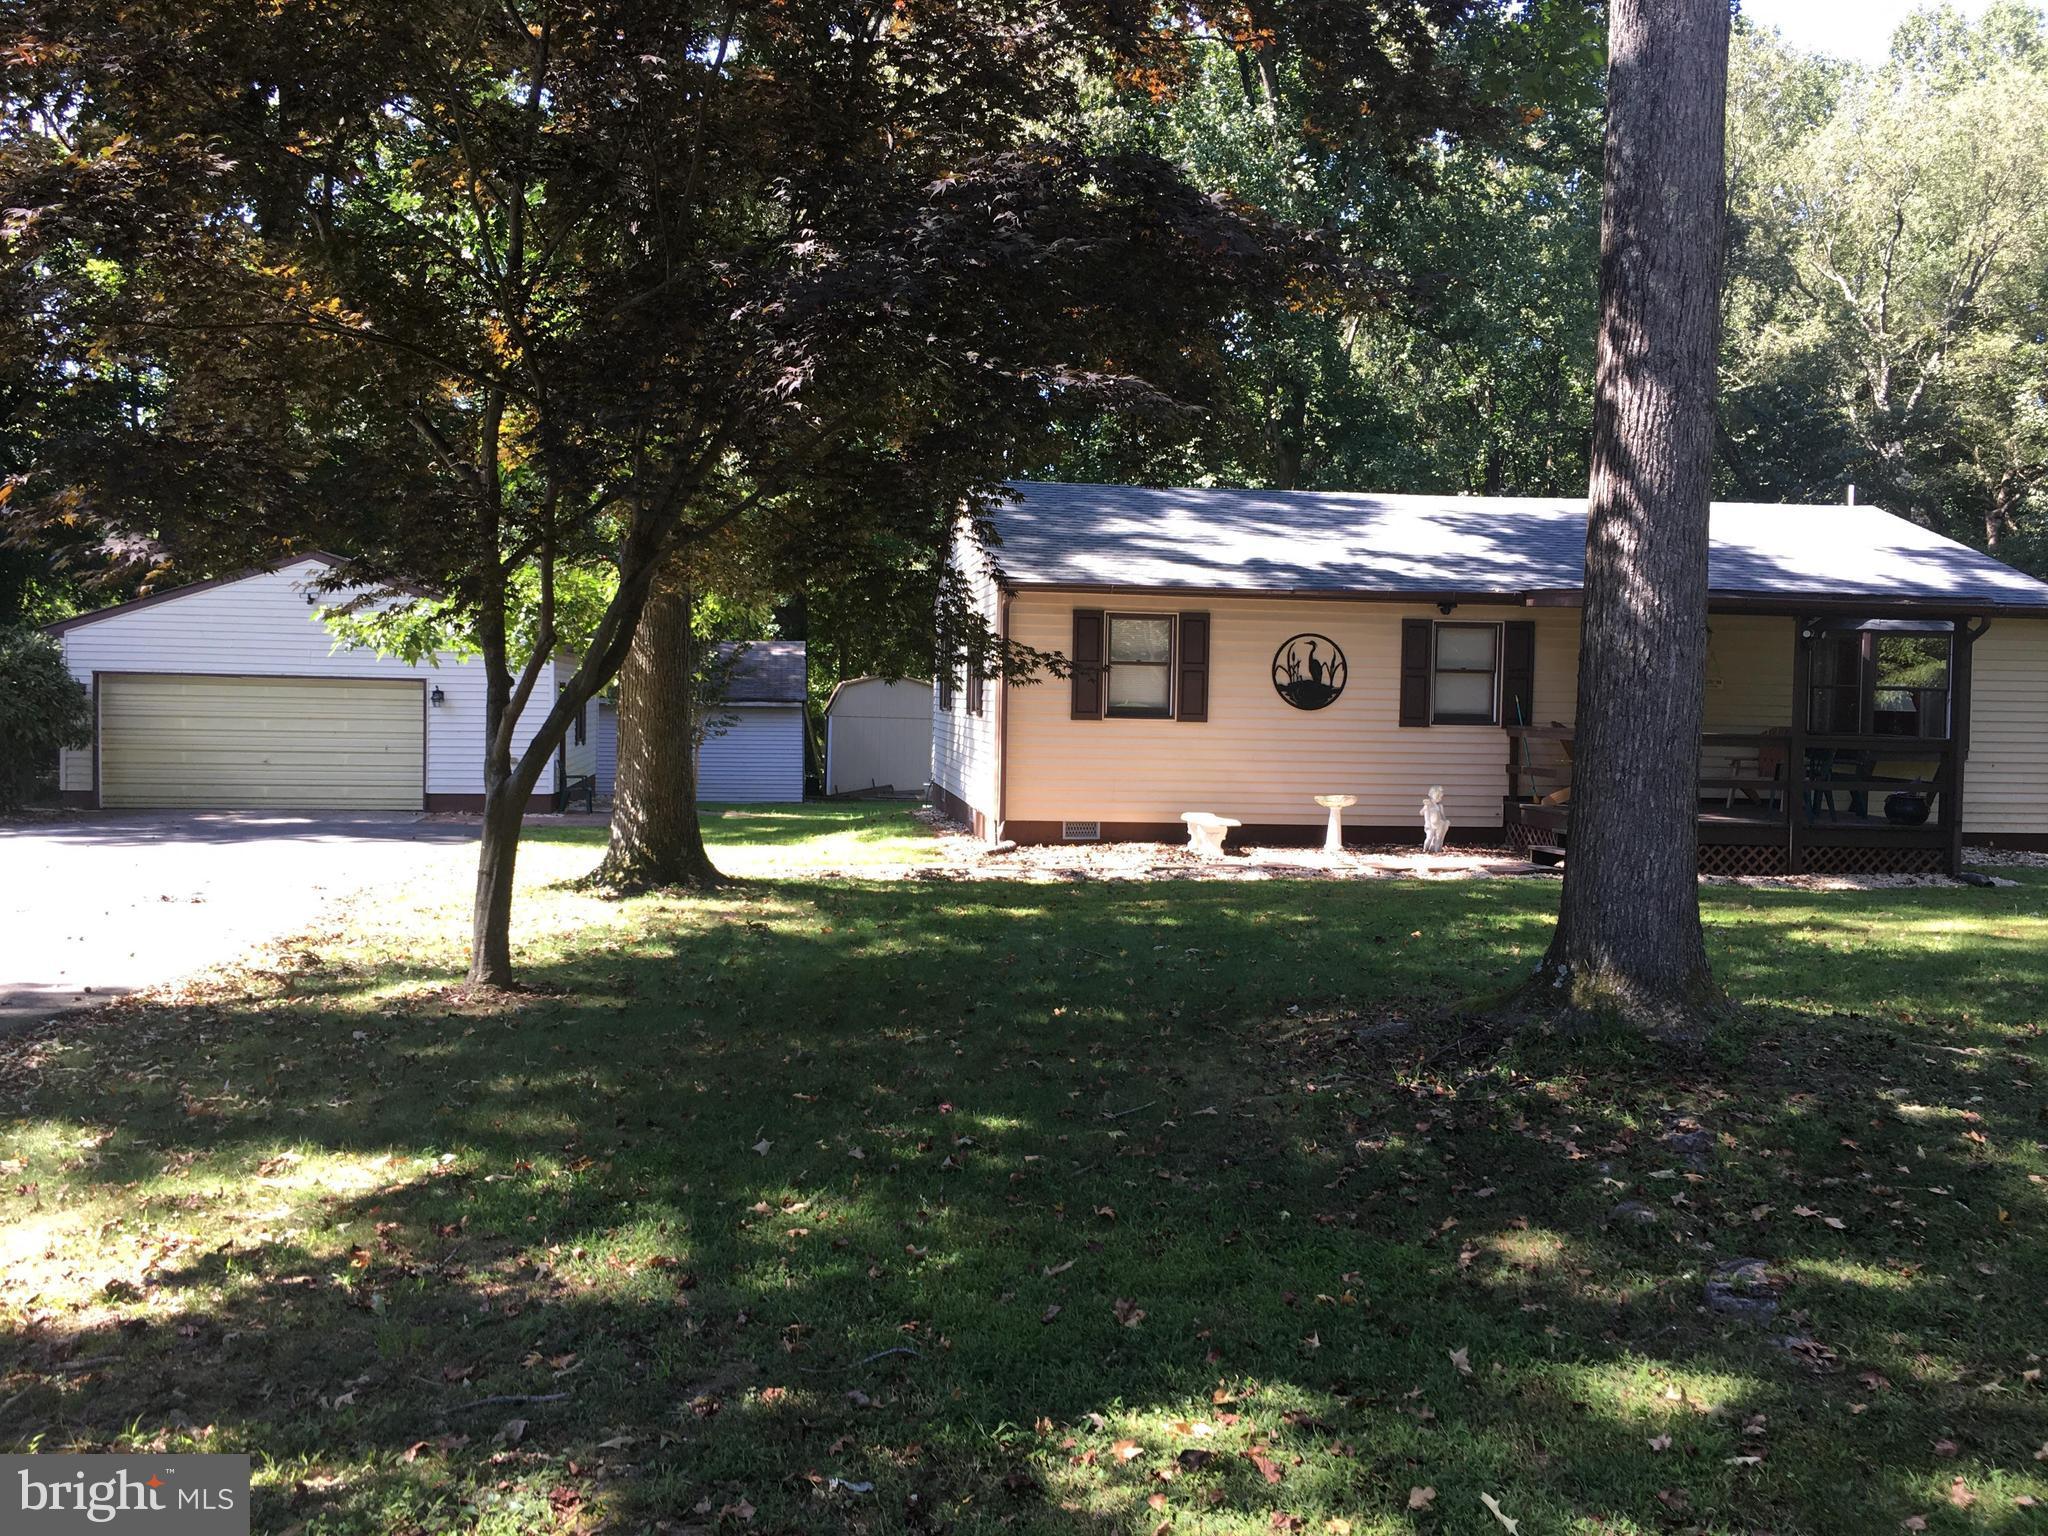 125 Ohio Ave, Earleville, MD, 21919